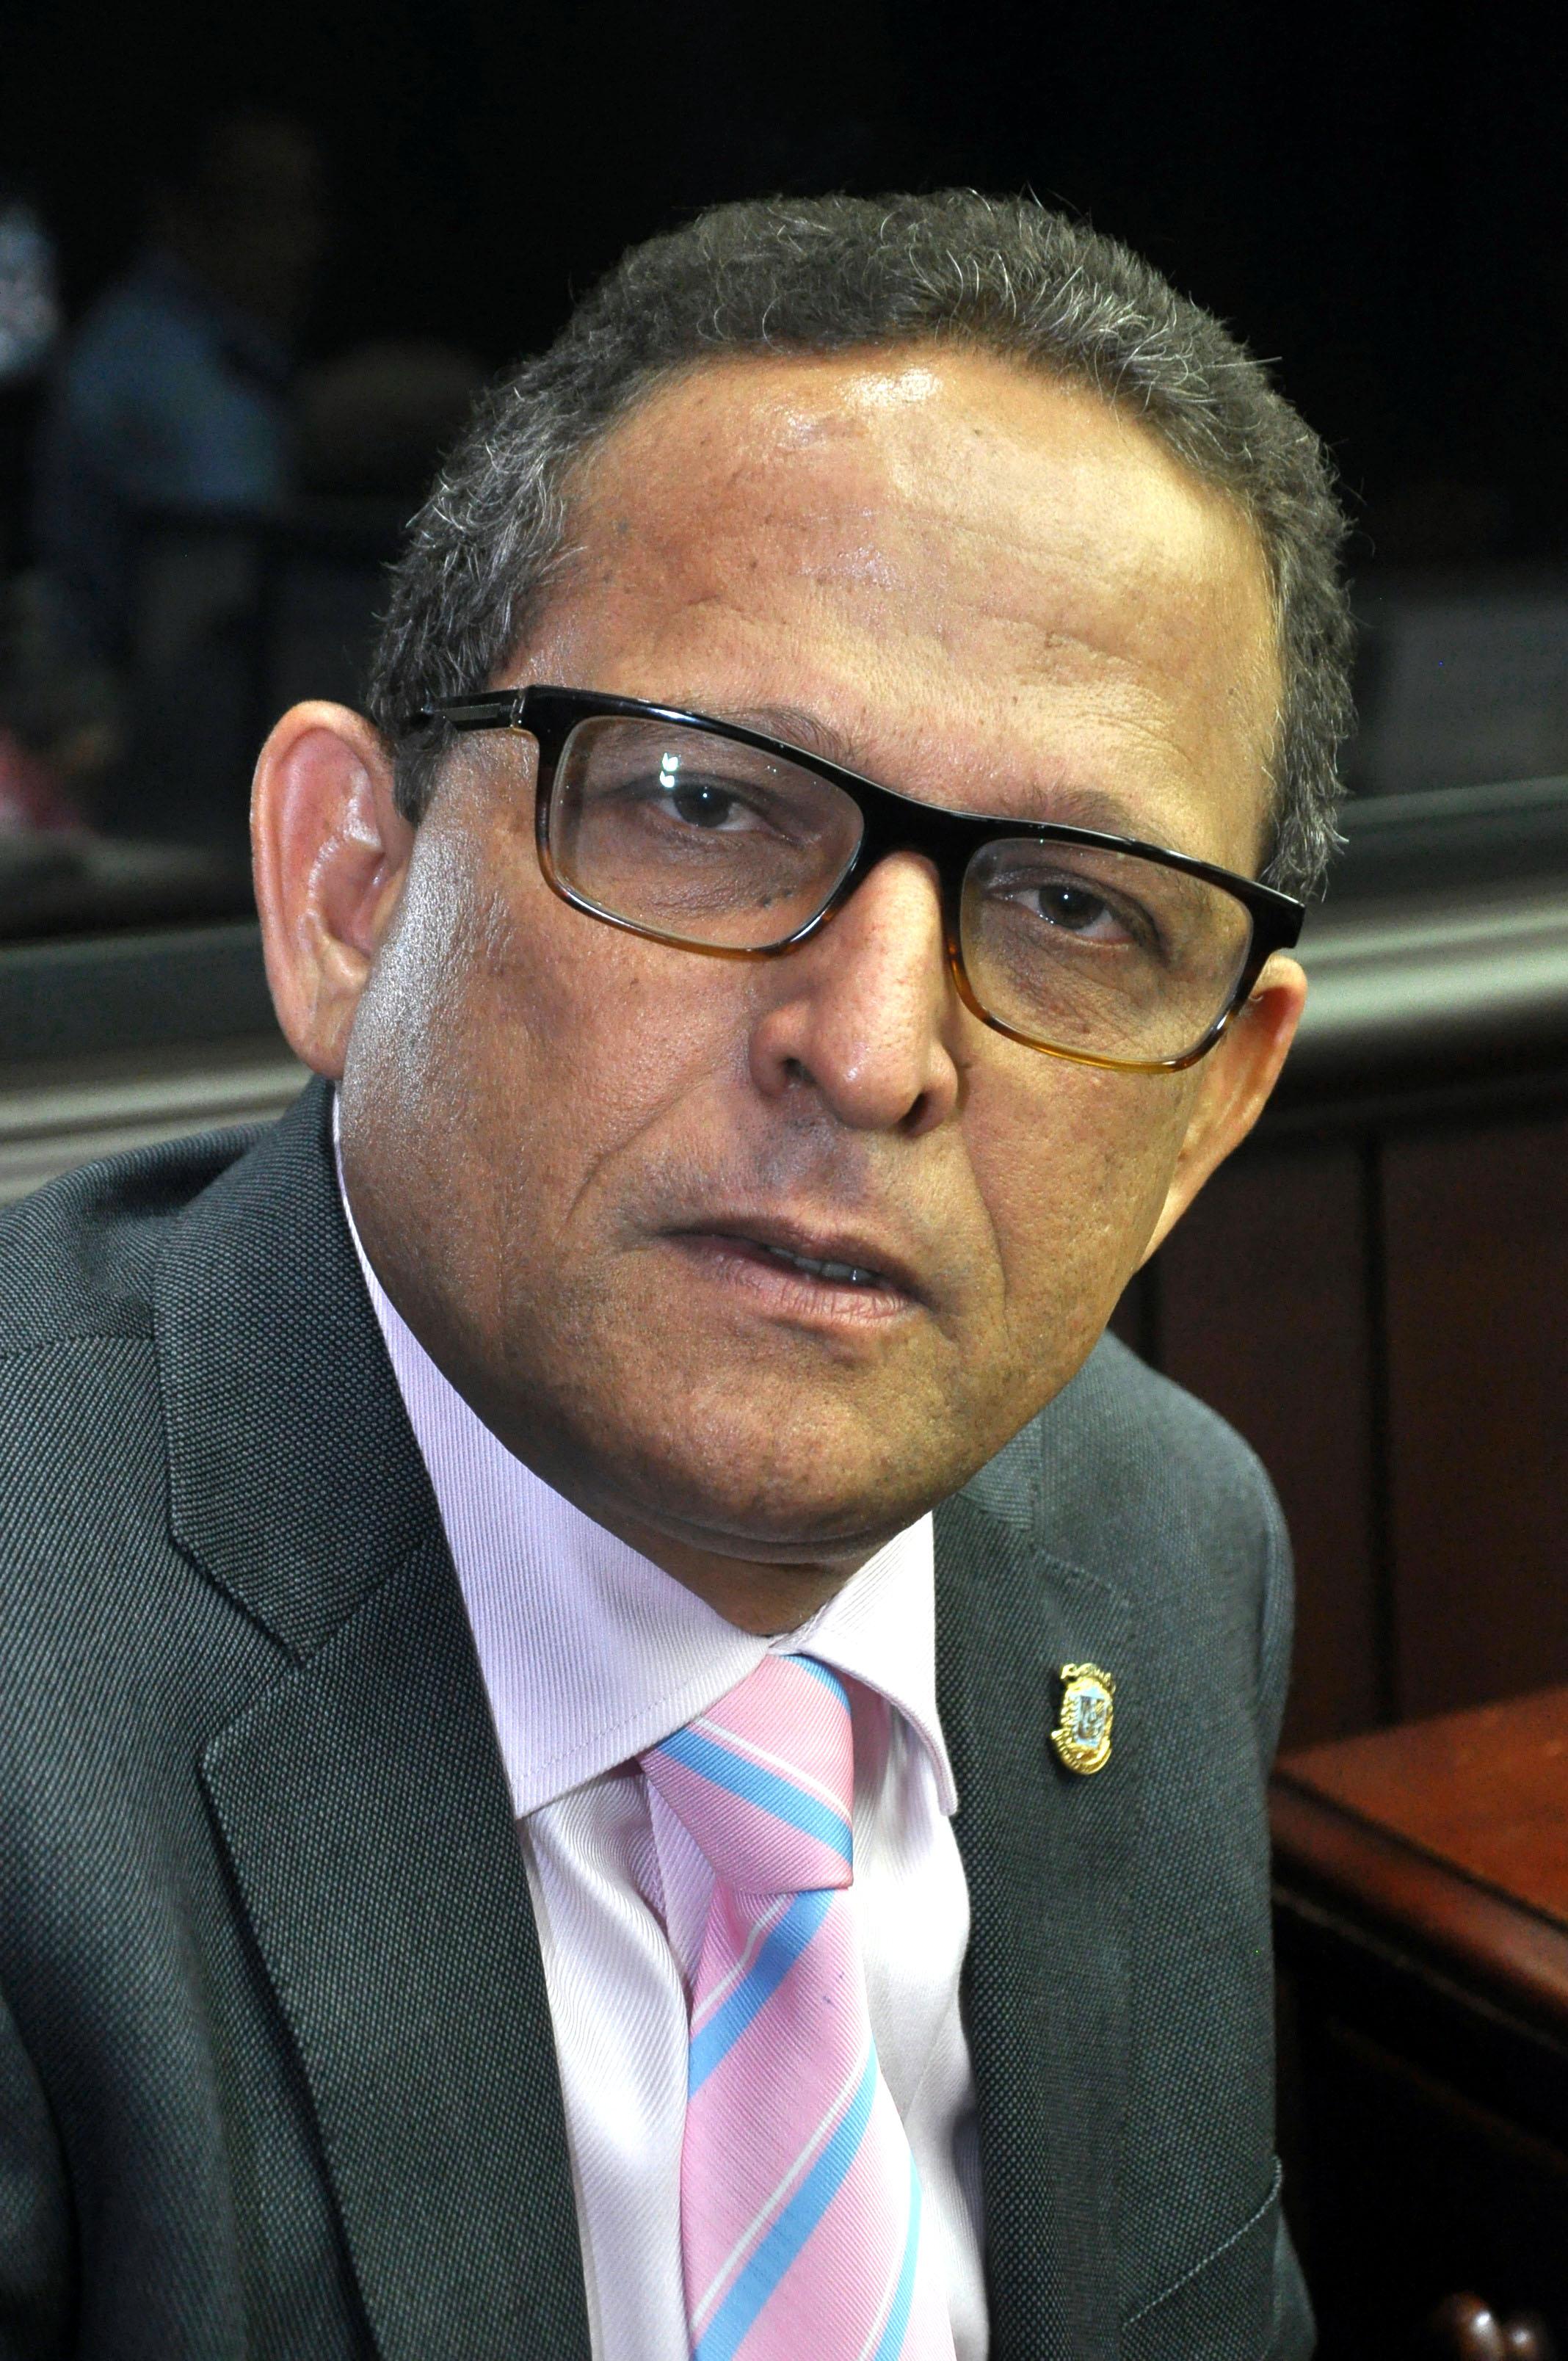 Resultado de imagen para Diputado Darío Zapata